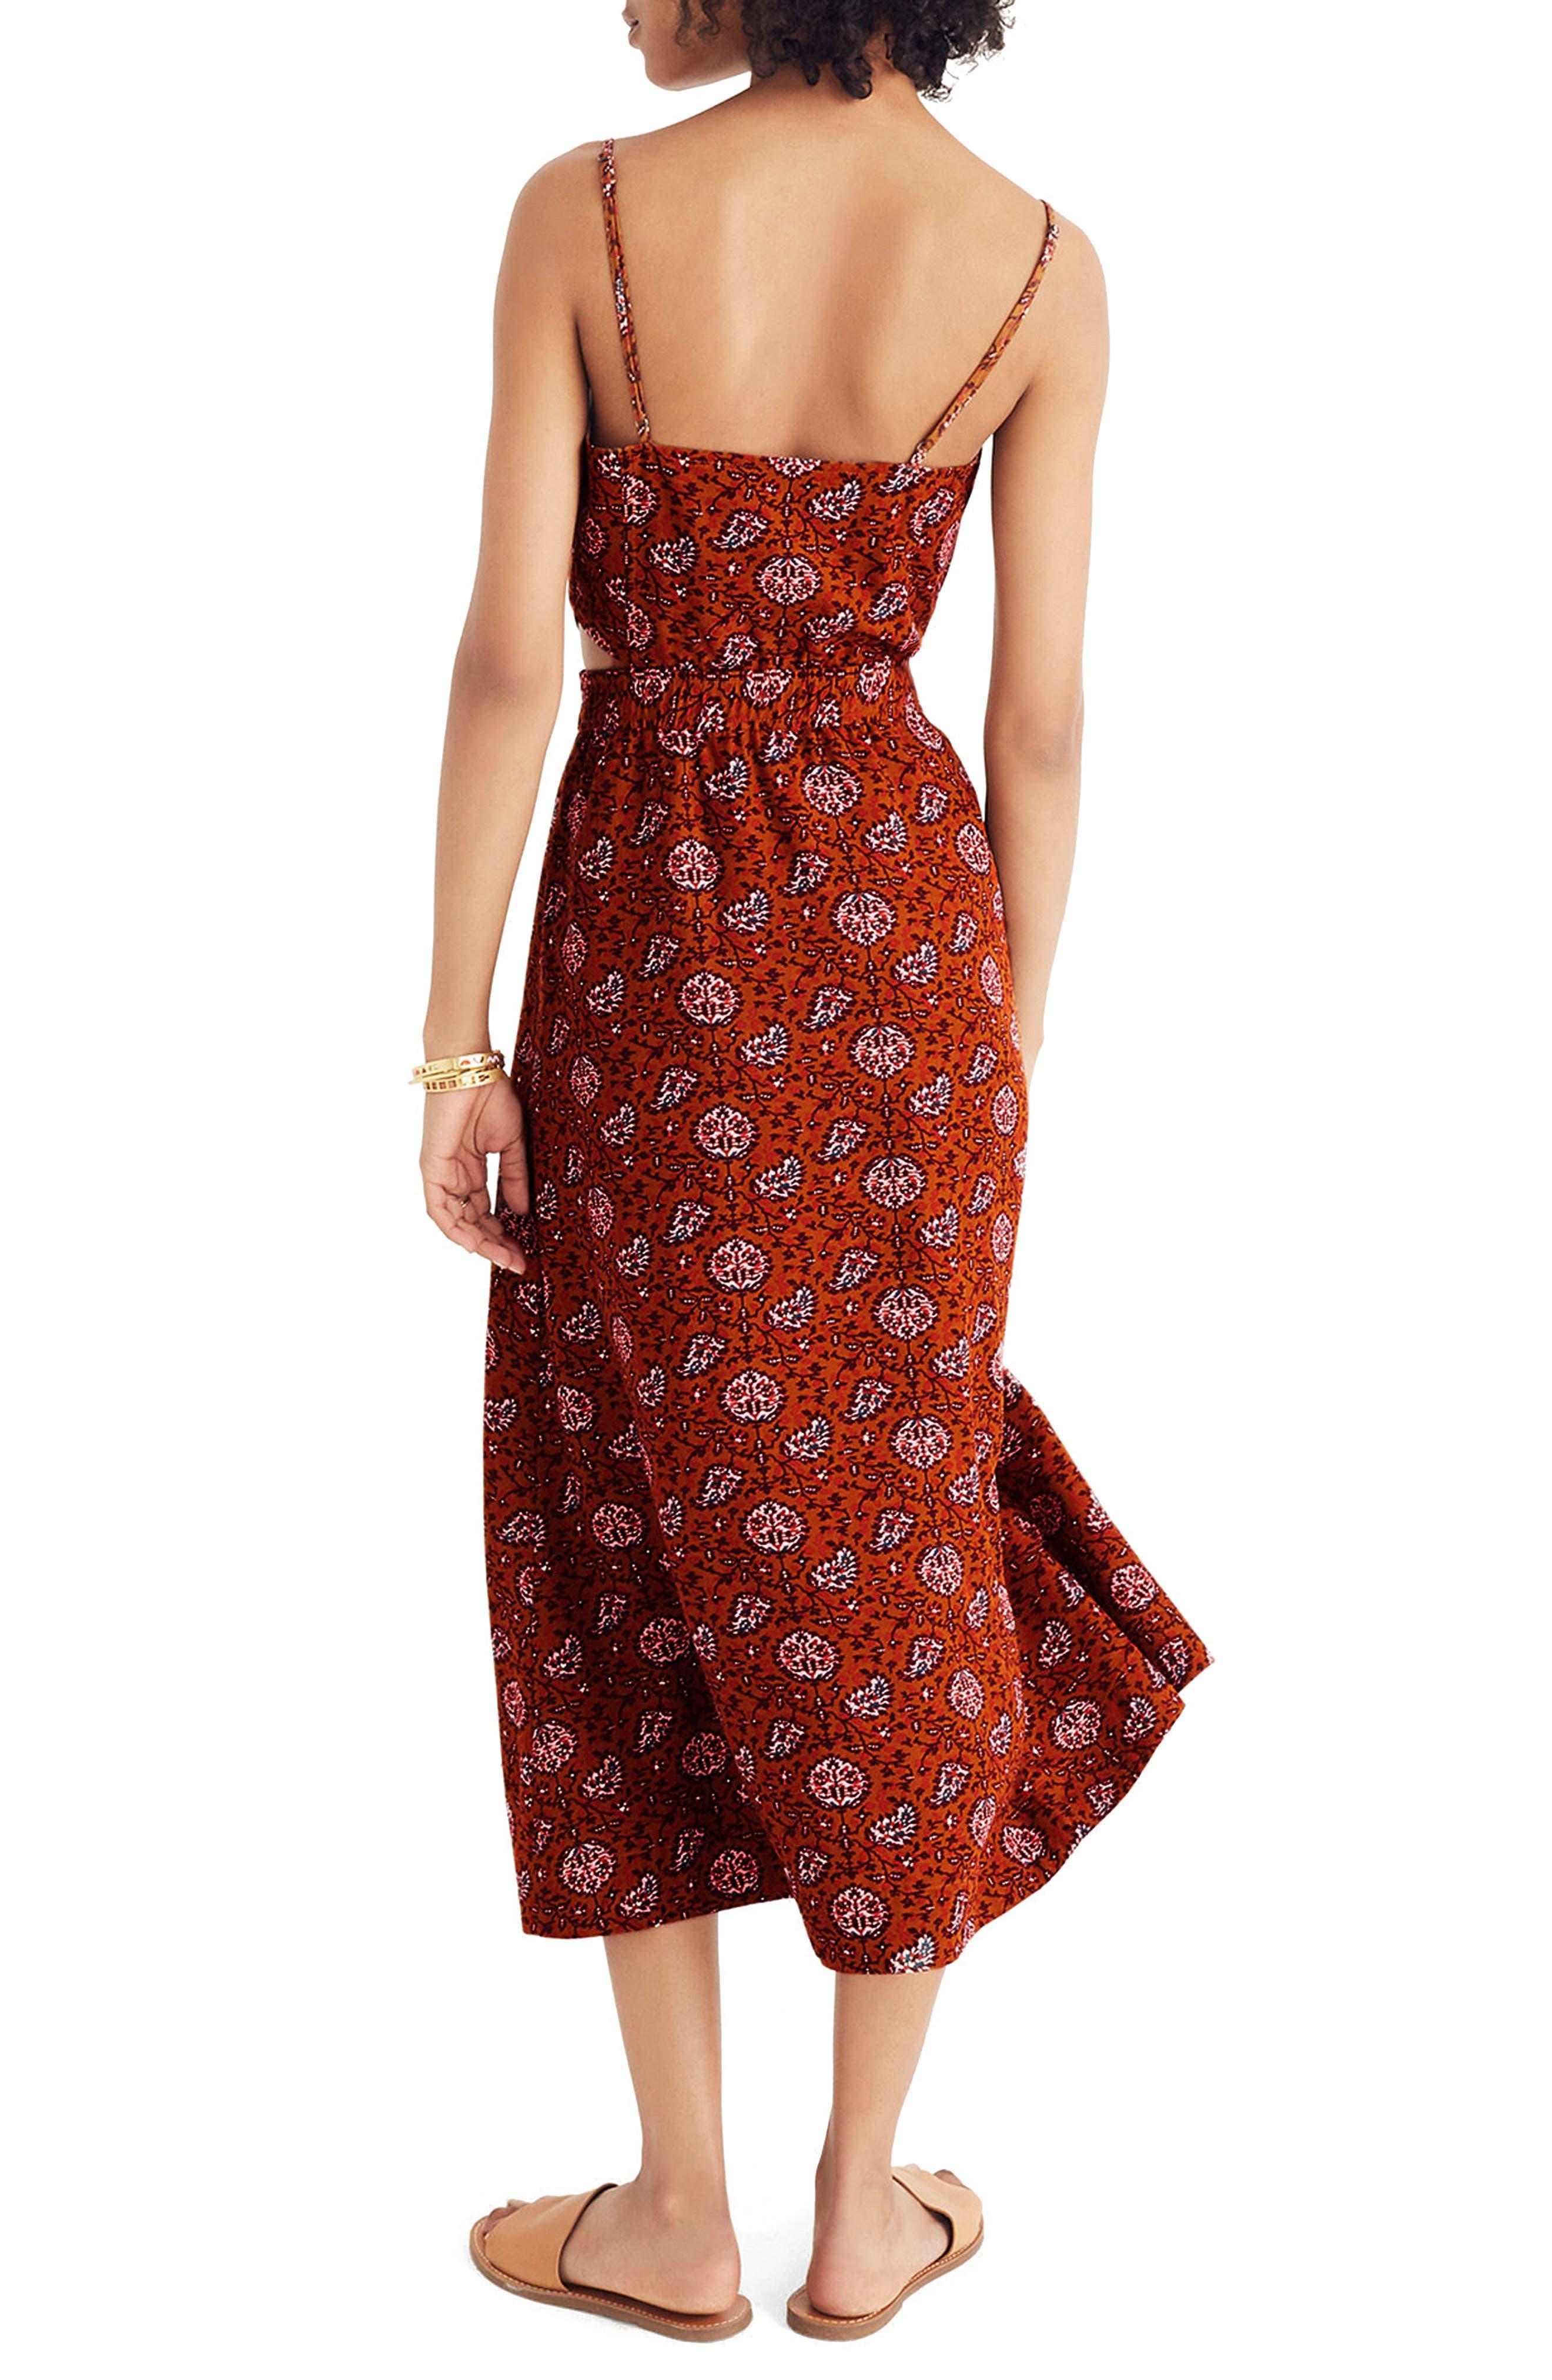 MADEWELL,                             Warm Paisley Cutout Camisole Midi Dress,                             Alternate thumbnail 2, color,                             200